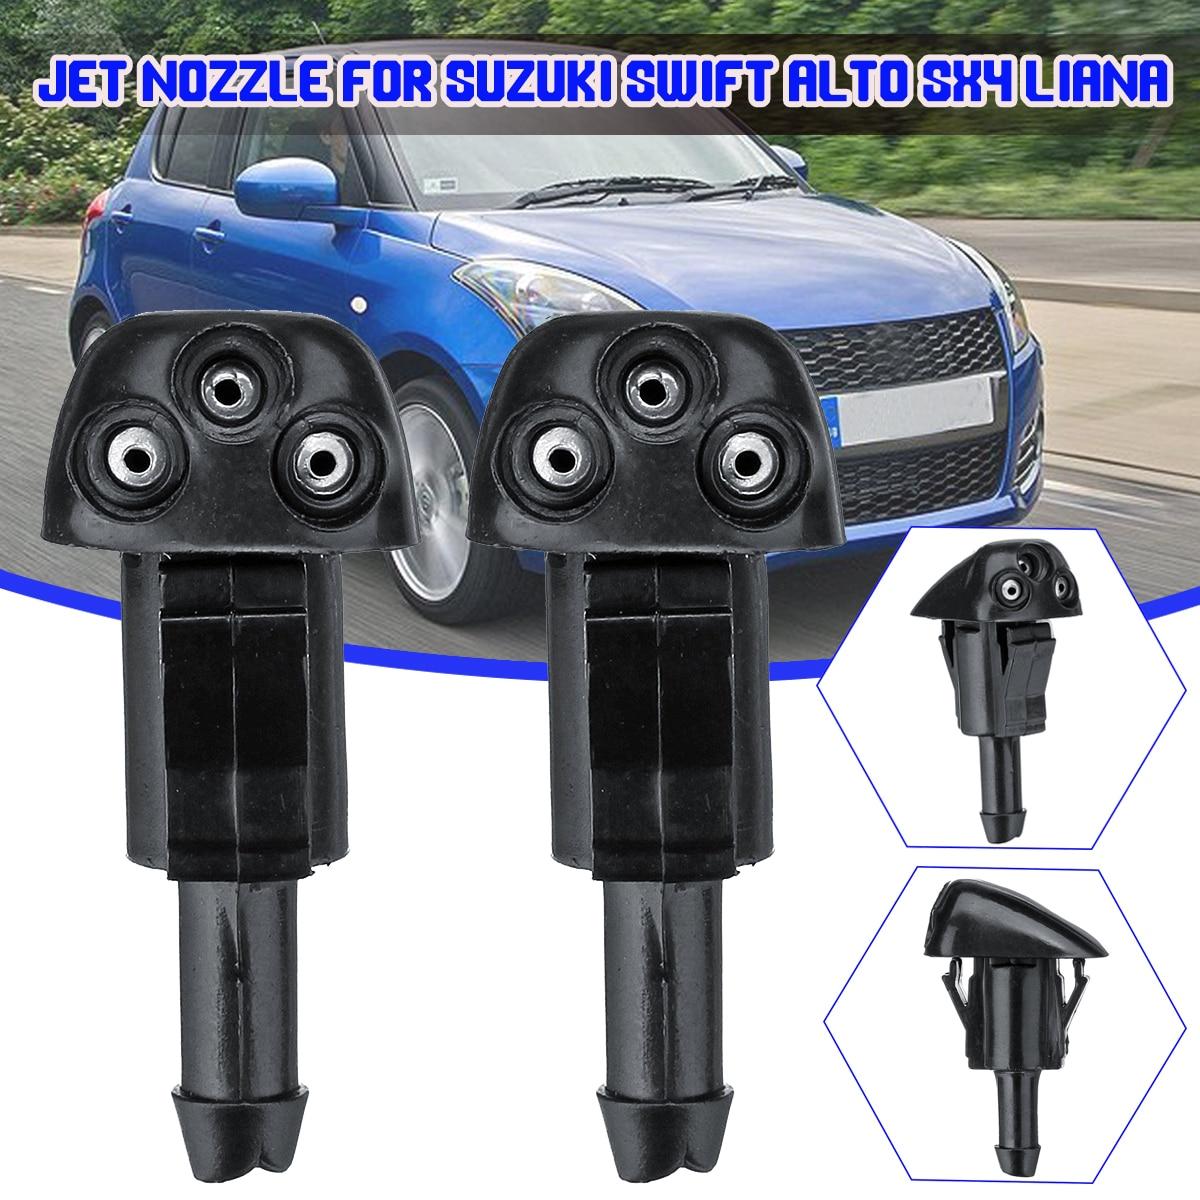 2X Car Windshield Washer Wiper Water Jet Nozzle Inlet Push For Suzuki Swift Alto SX4